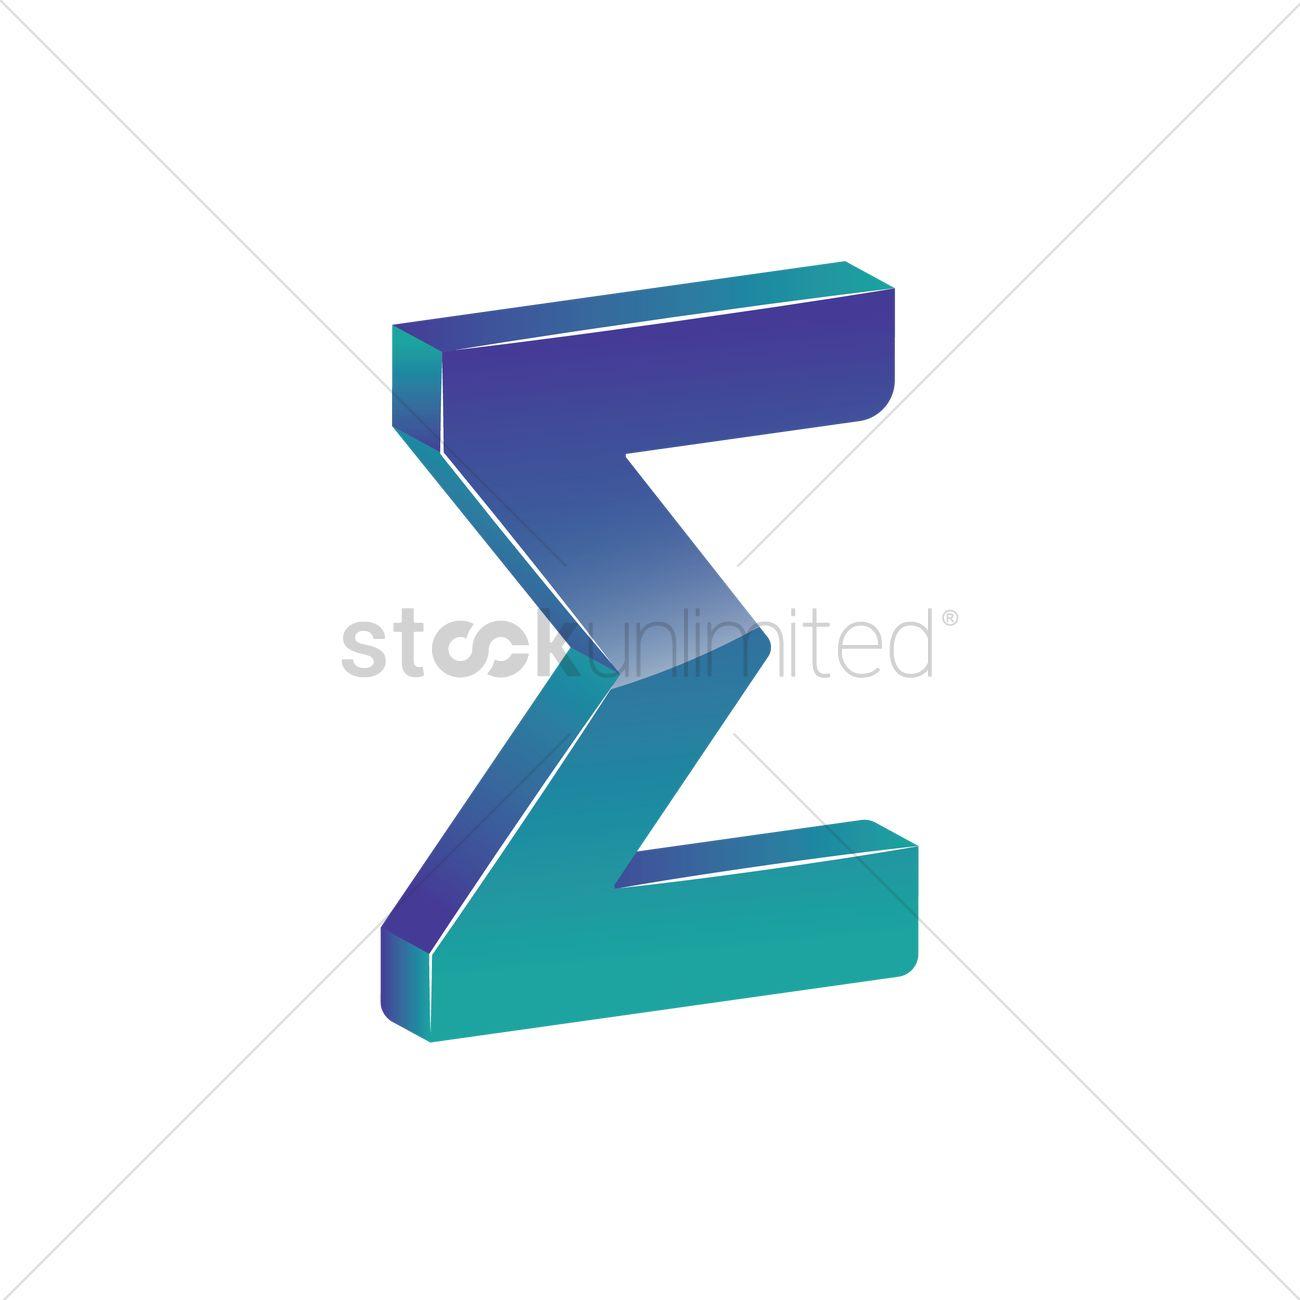 Sigma Symbol Vector Image 1866475 Stockunlimited